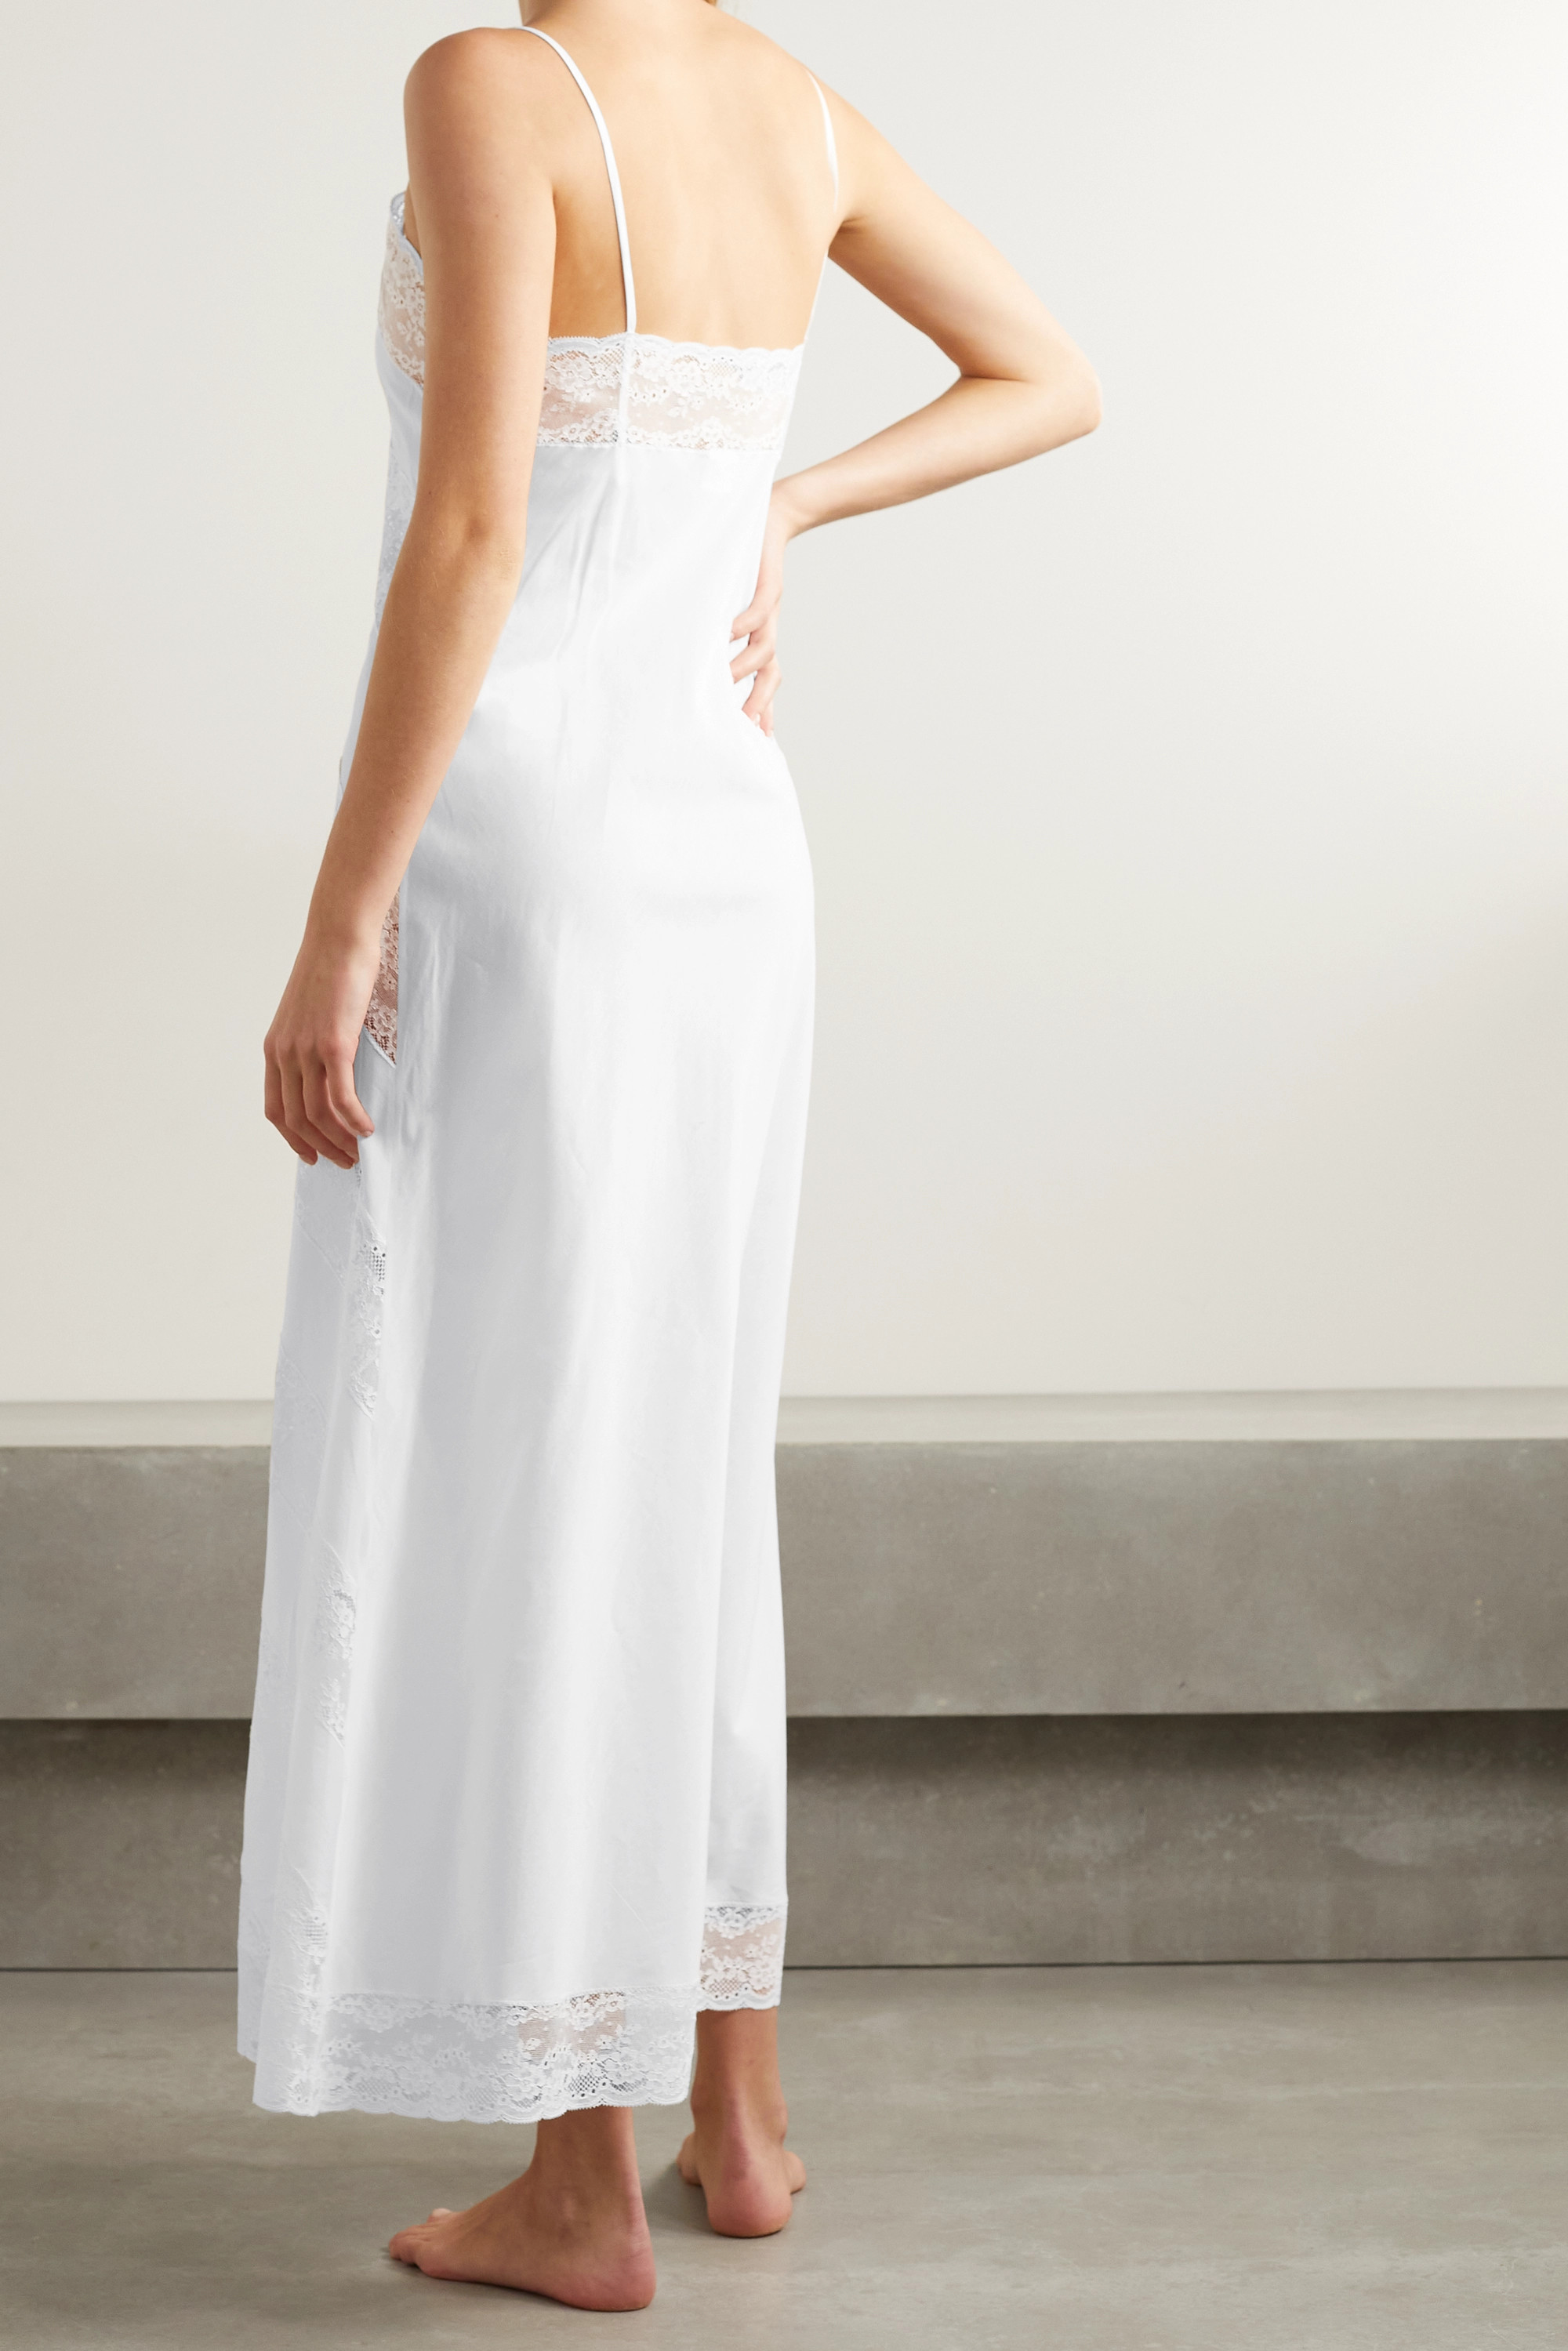 Loretta Caponi Gabrielle lace-paneled cotton-voile nightdress